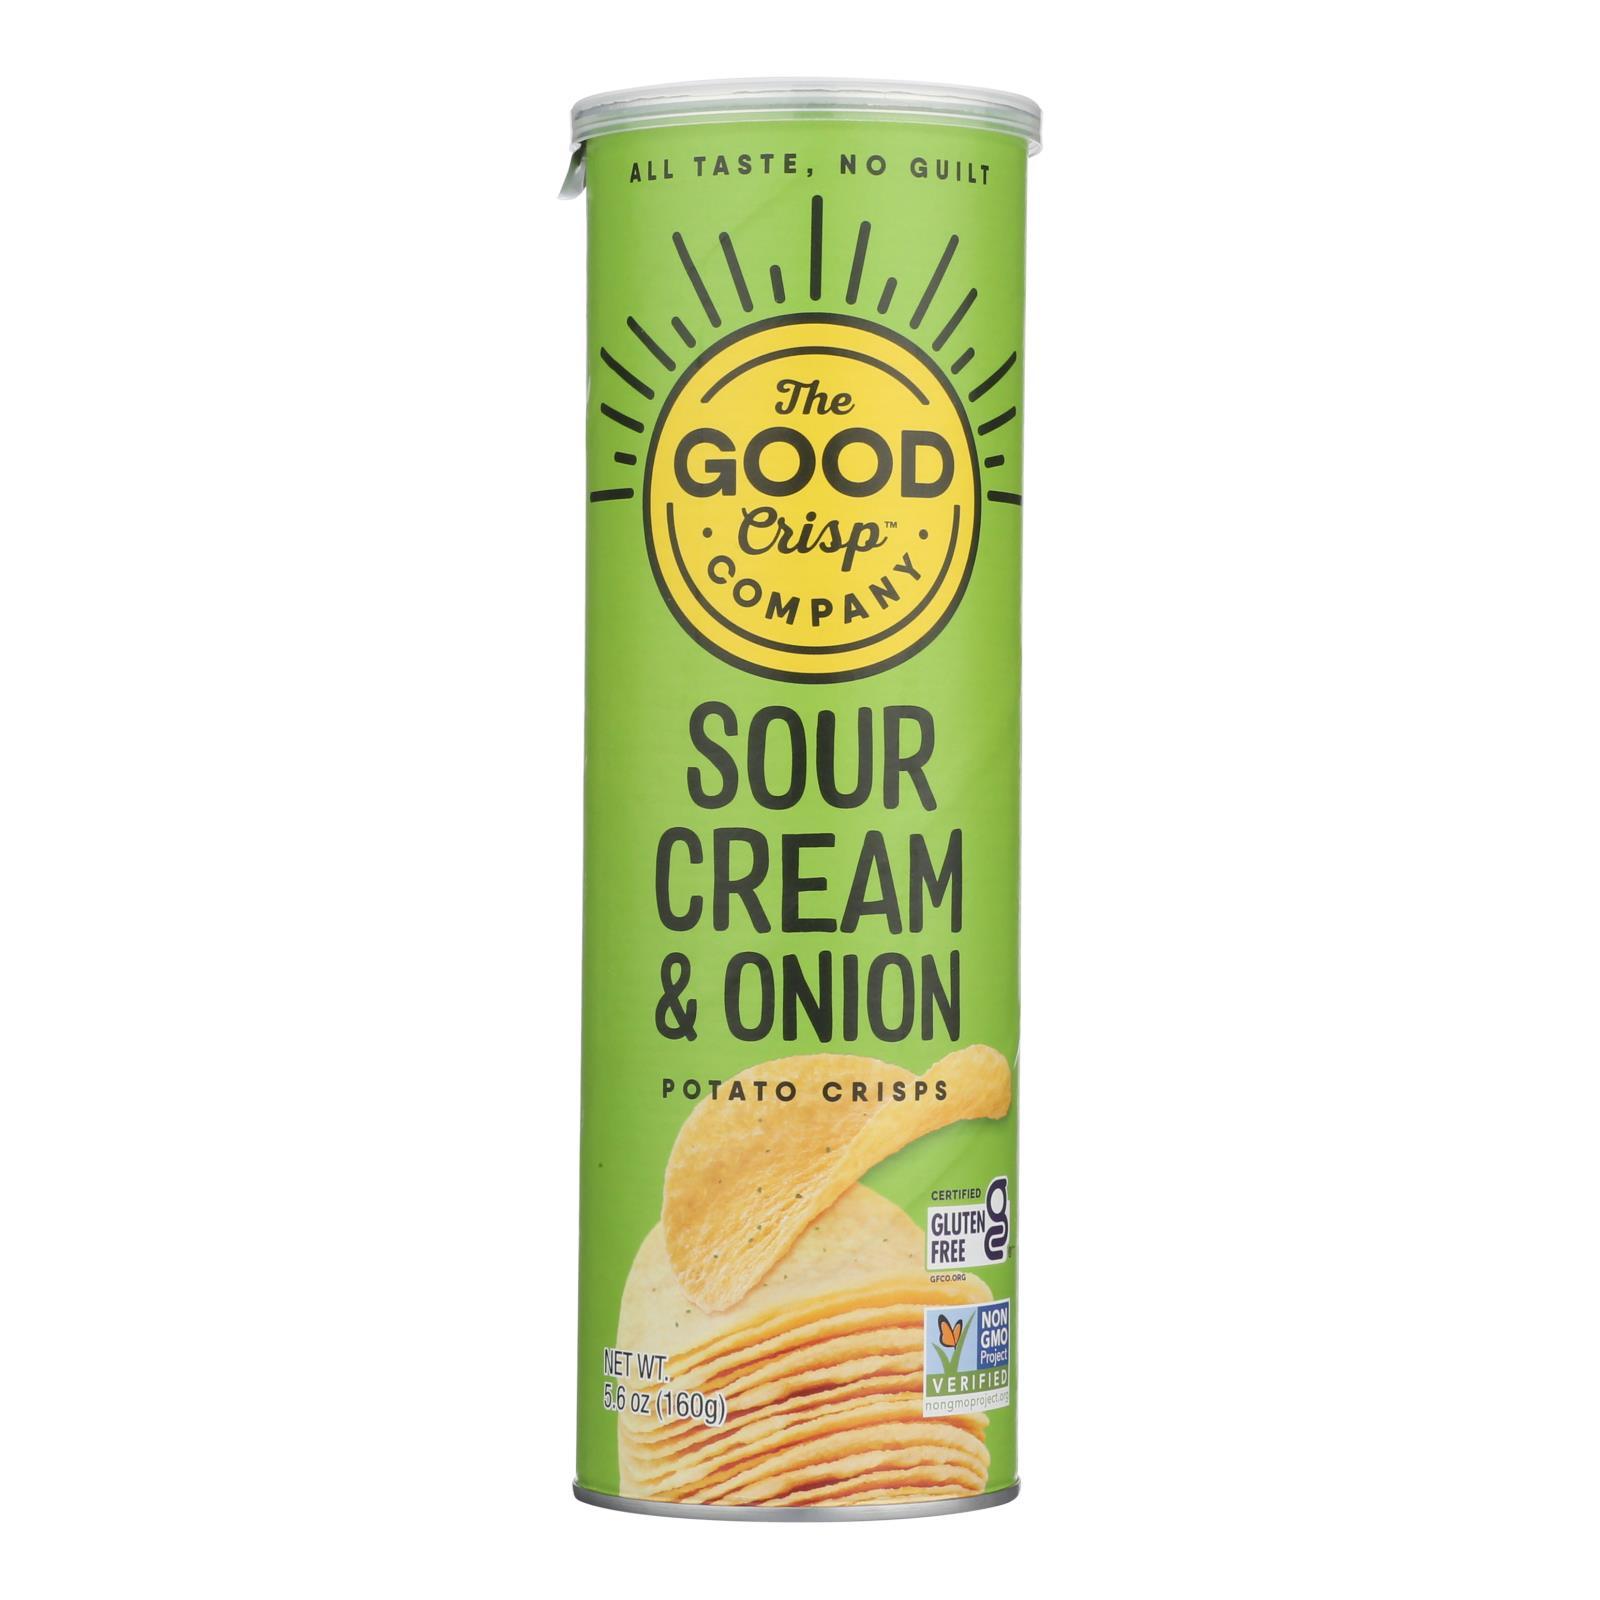 The Good Crisp - Sour Cream and Onion - Case of 8 - 5.6 oz.